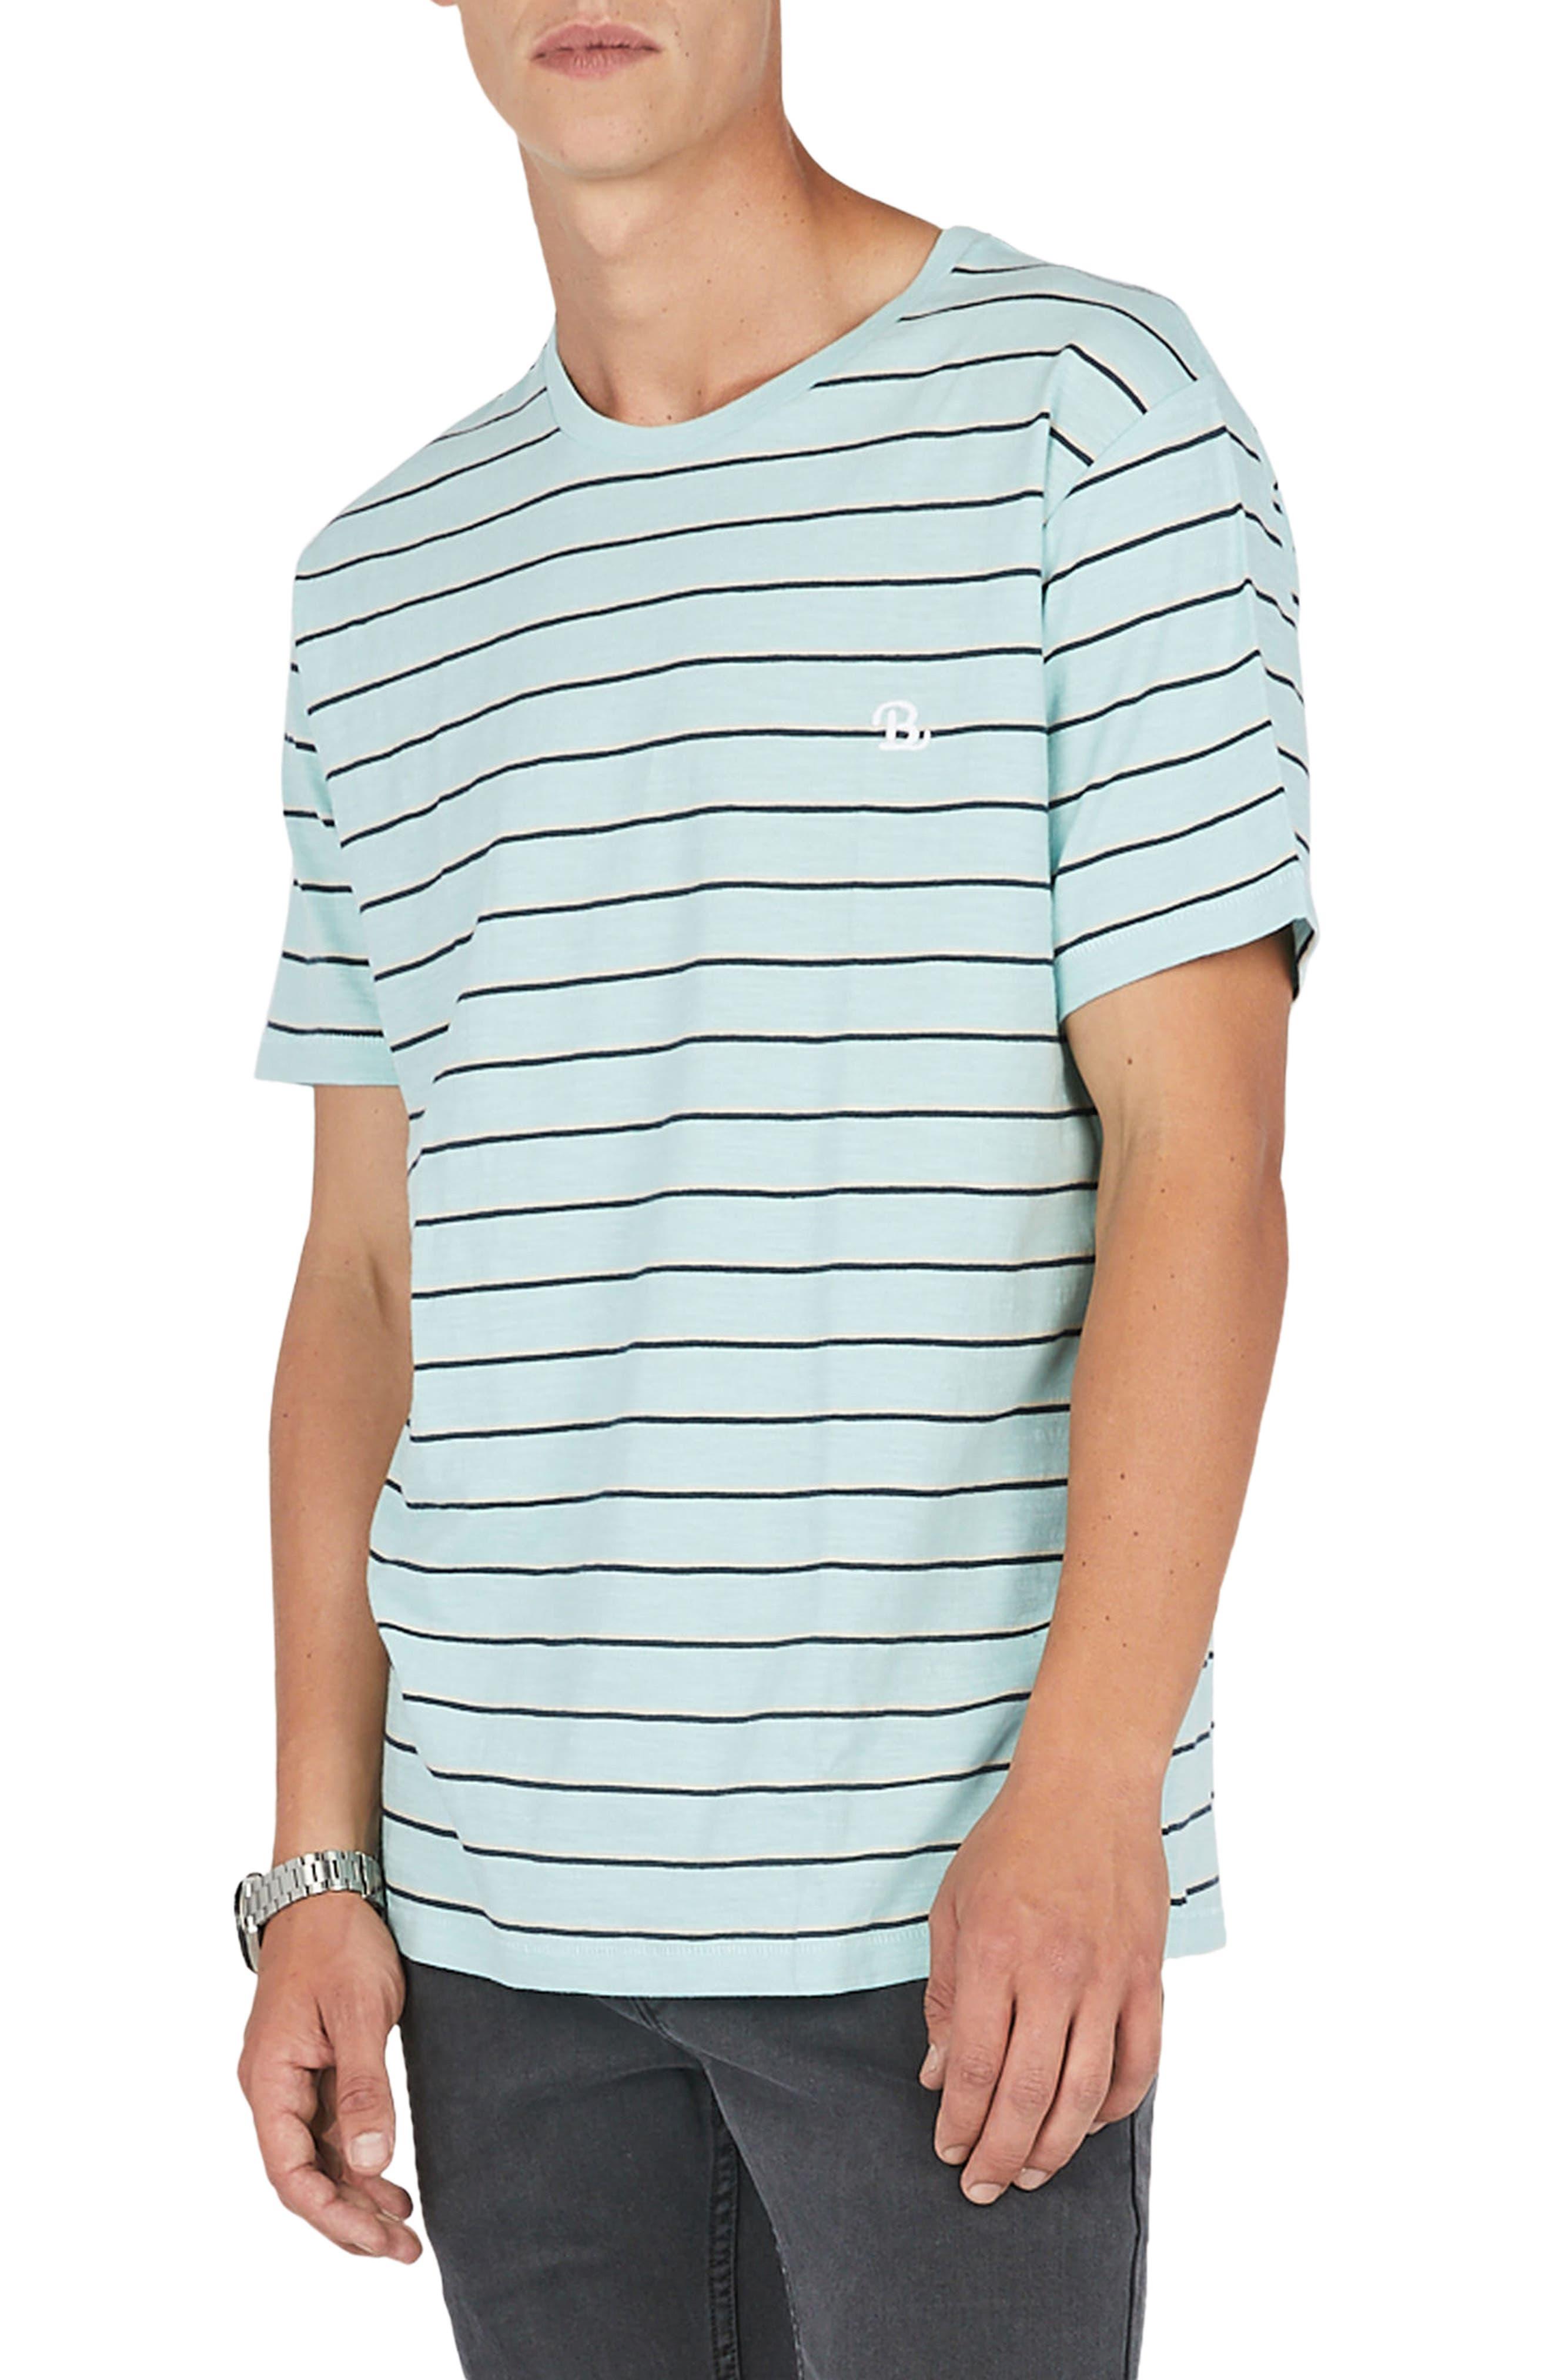 B.Schooled T-Shirt,                         Main,                         color, 400